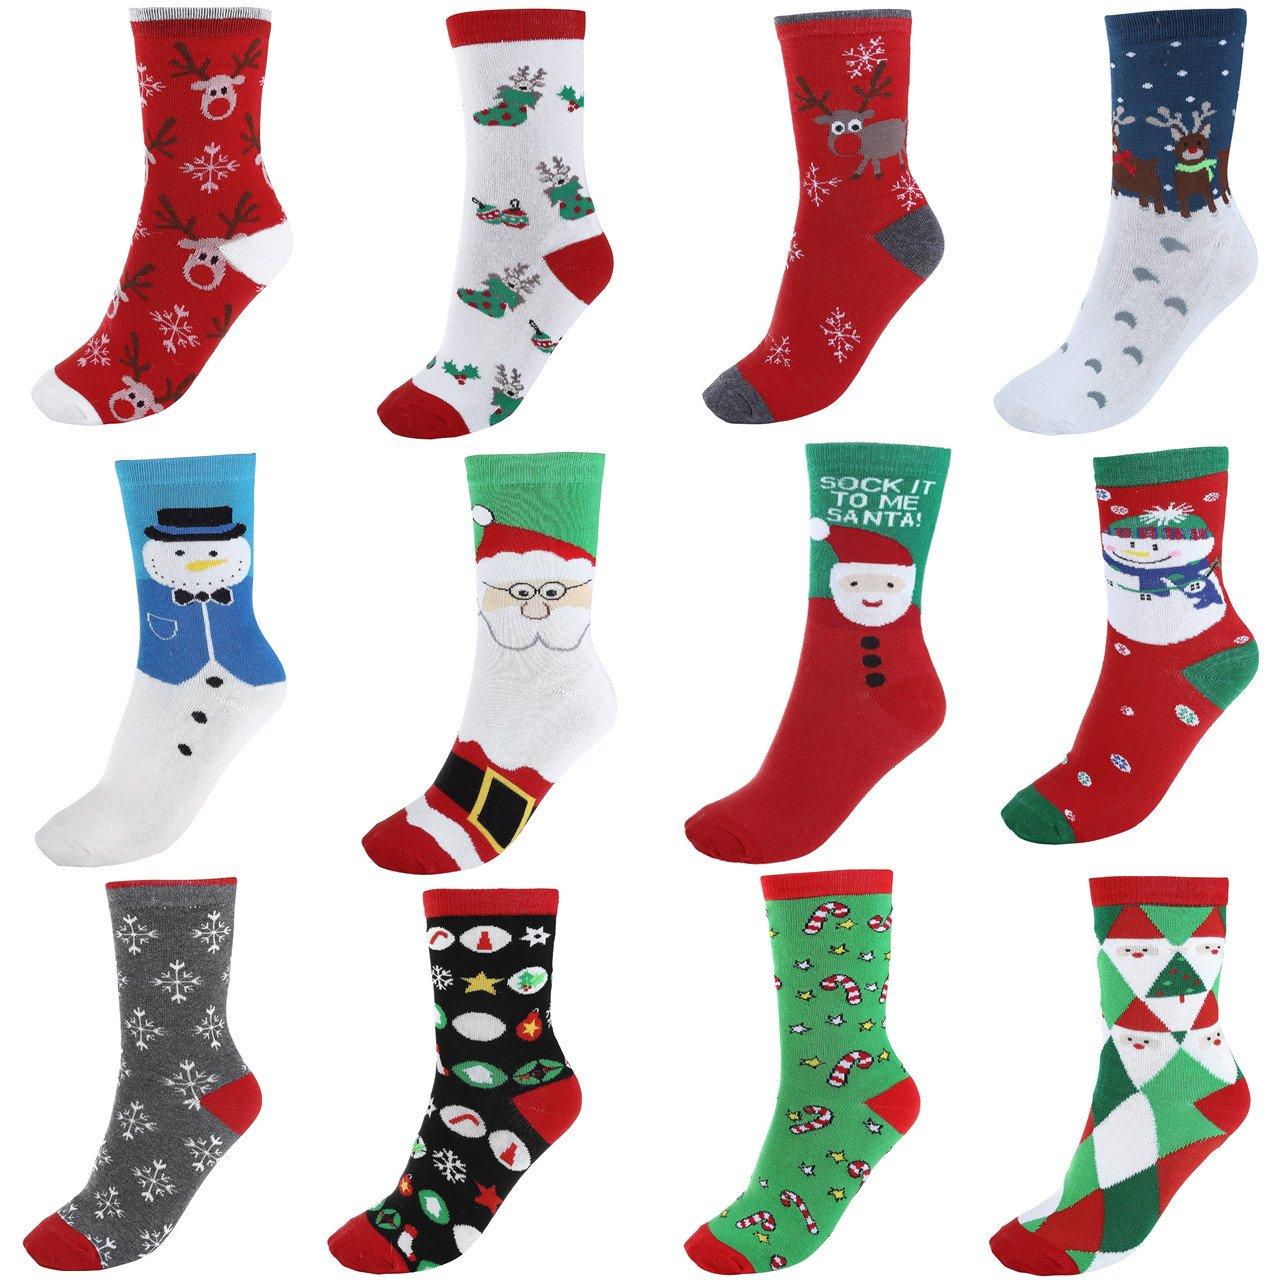 Ayliss 12Pairs Women\'s Cute Pattern Colorful Cotton Crew Socks ...